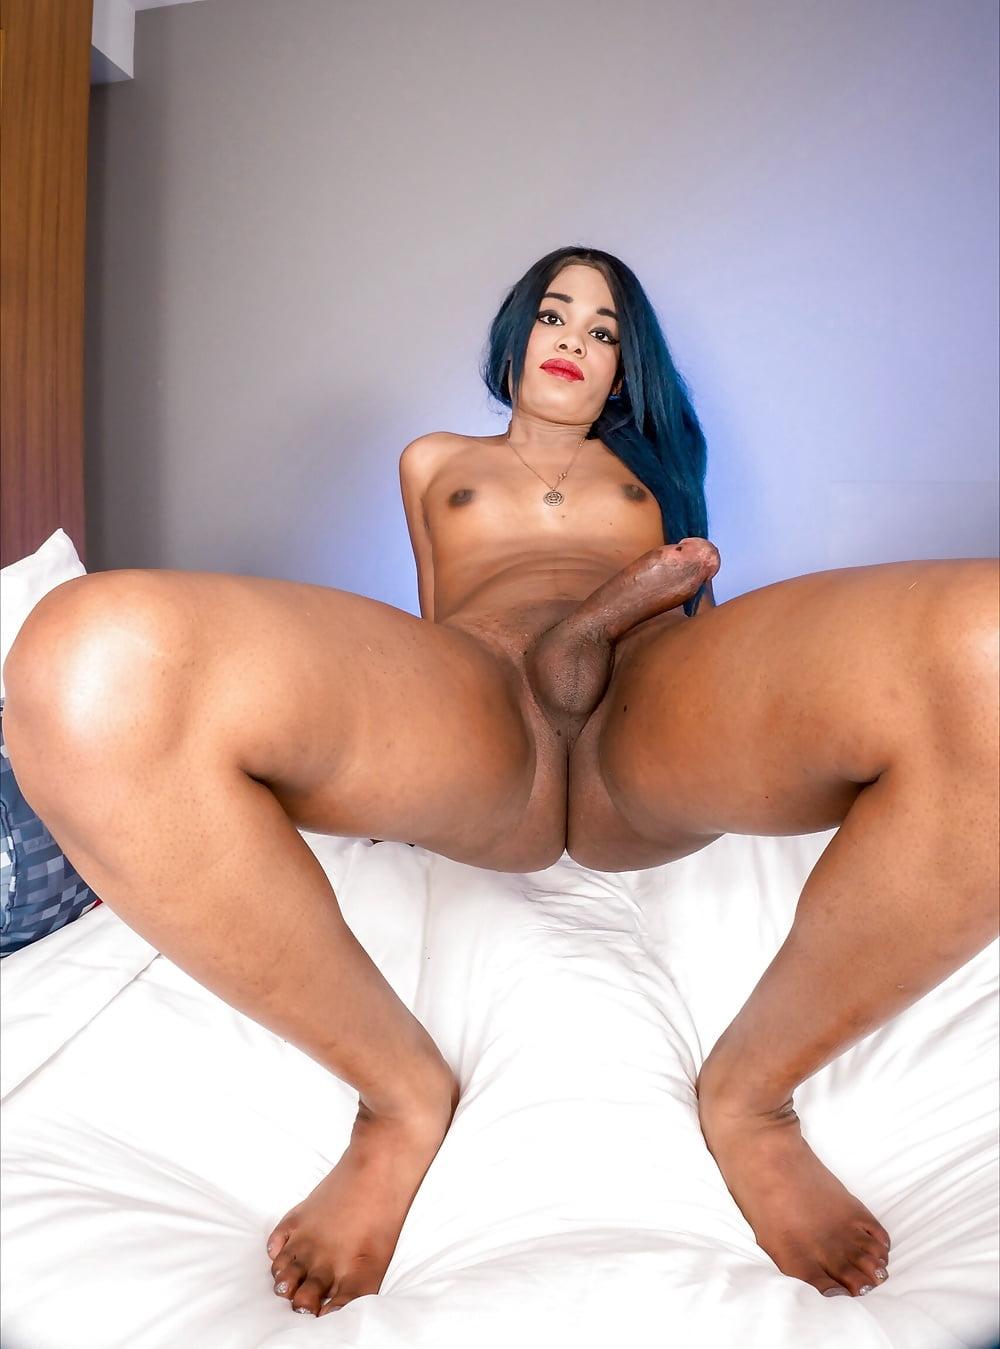 black-tgirl-jade-playmate-gitls-nude-images